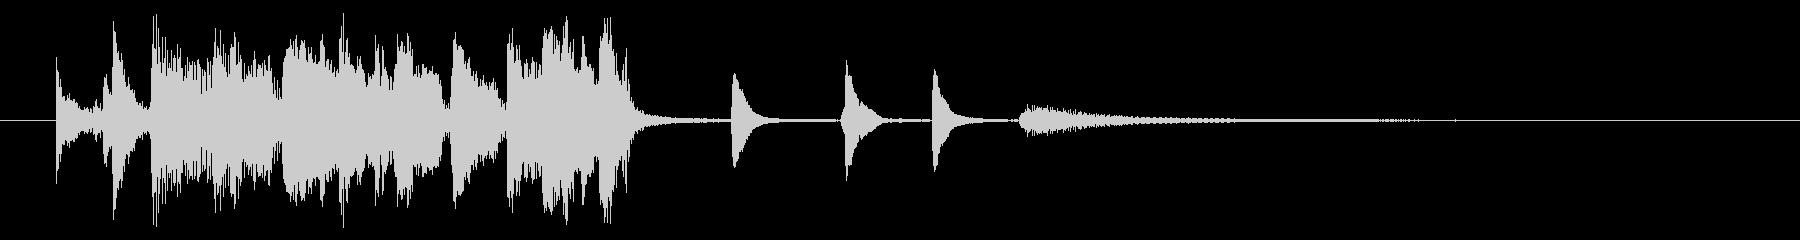 PopなSwing jazzジングルの未再生の波形